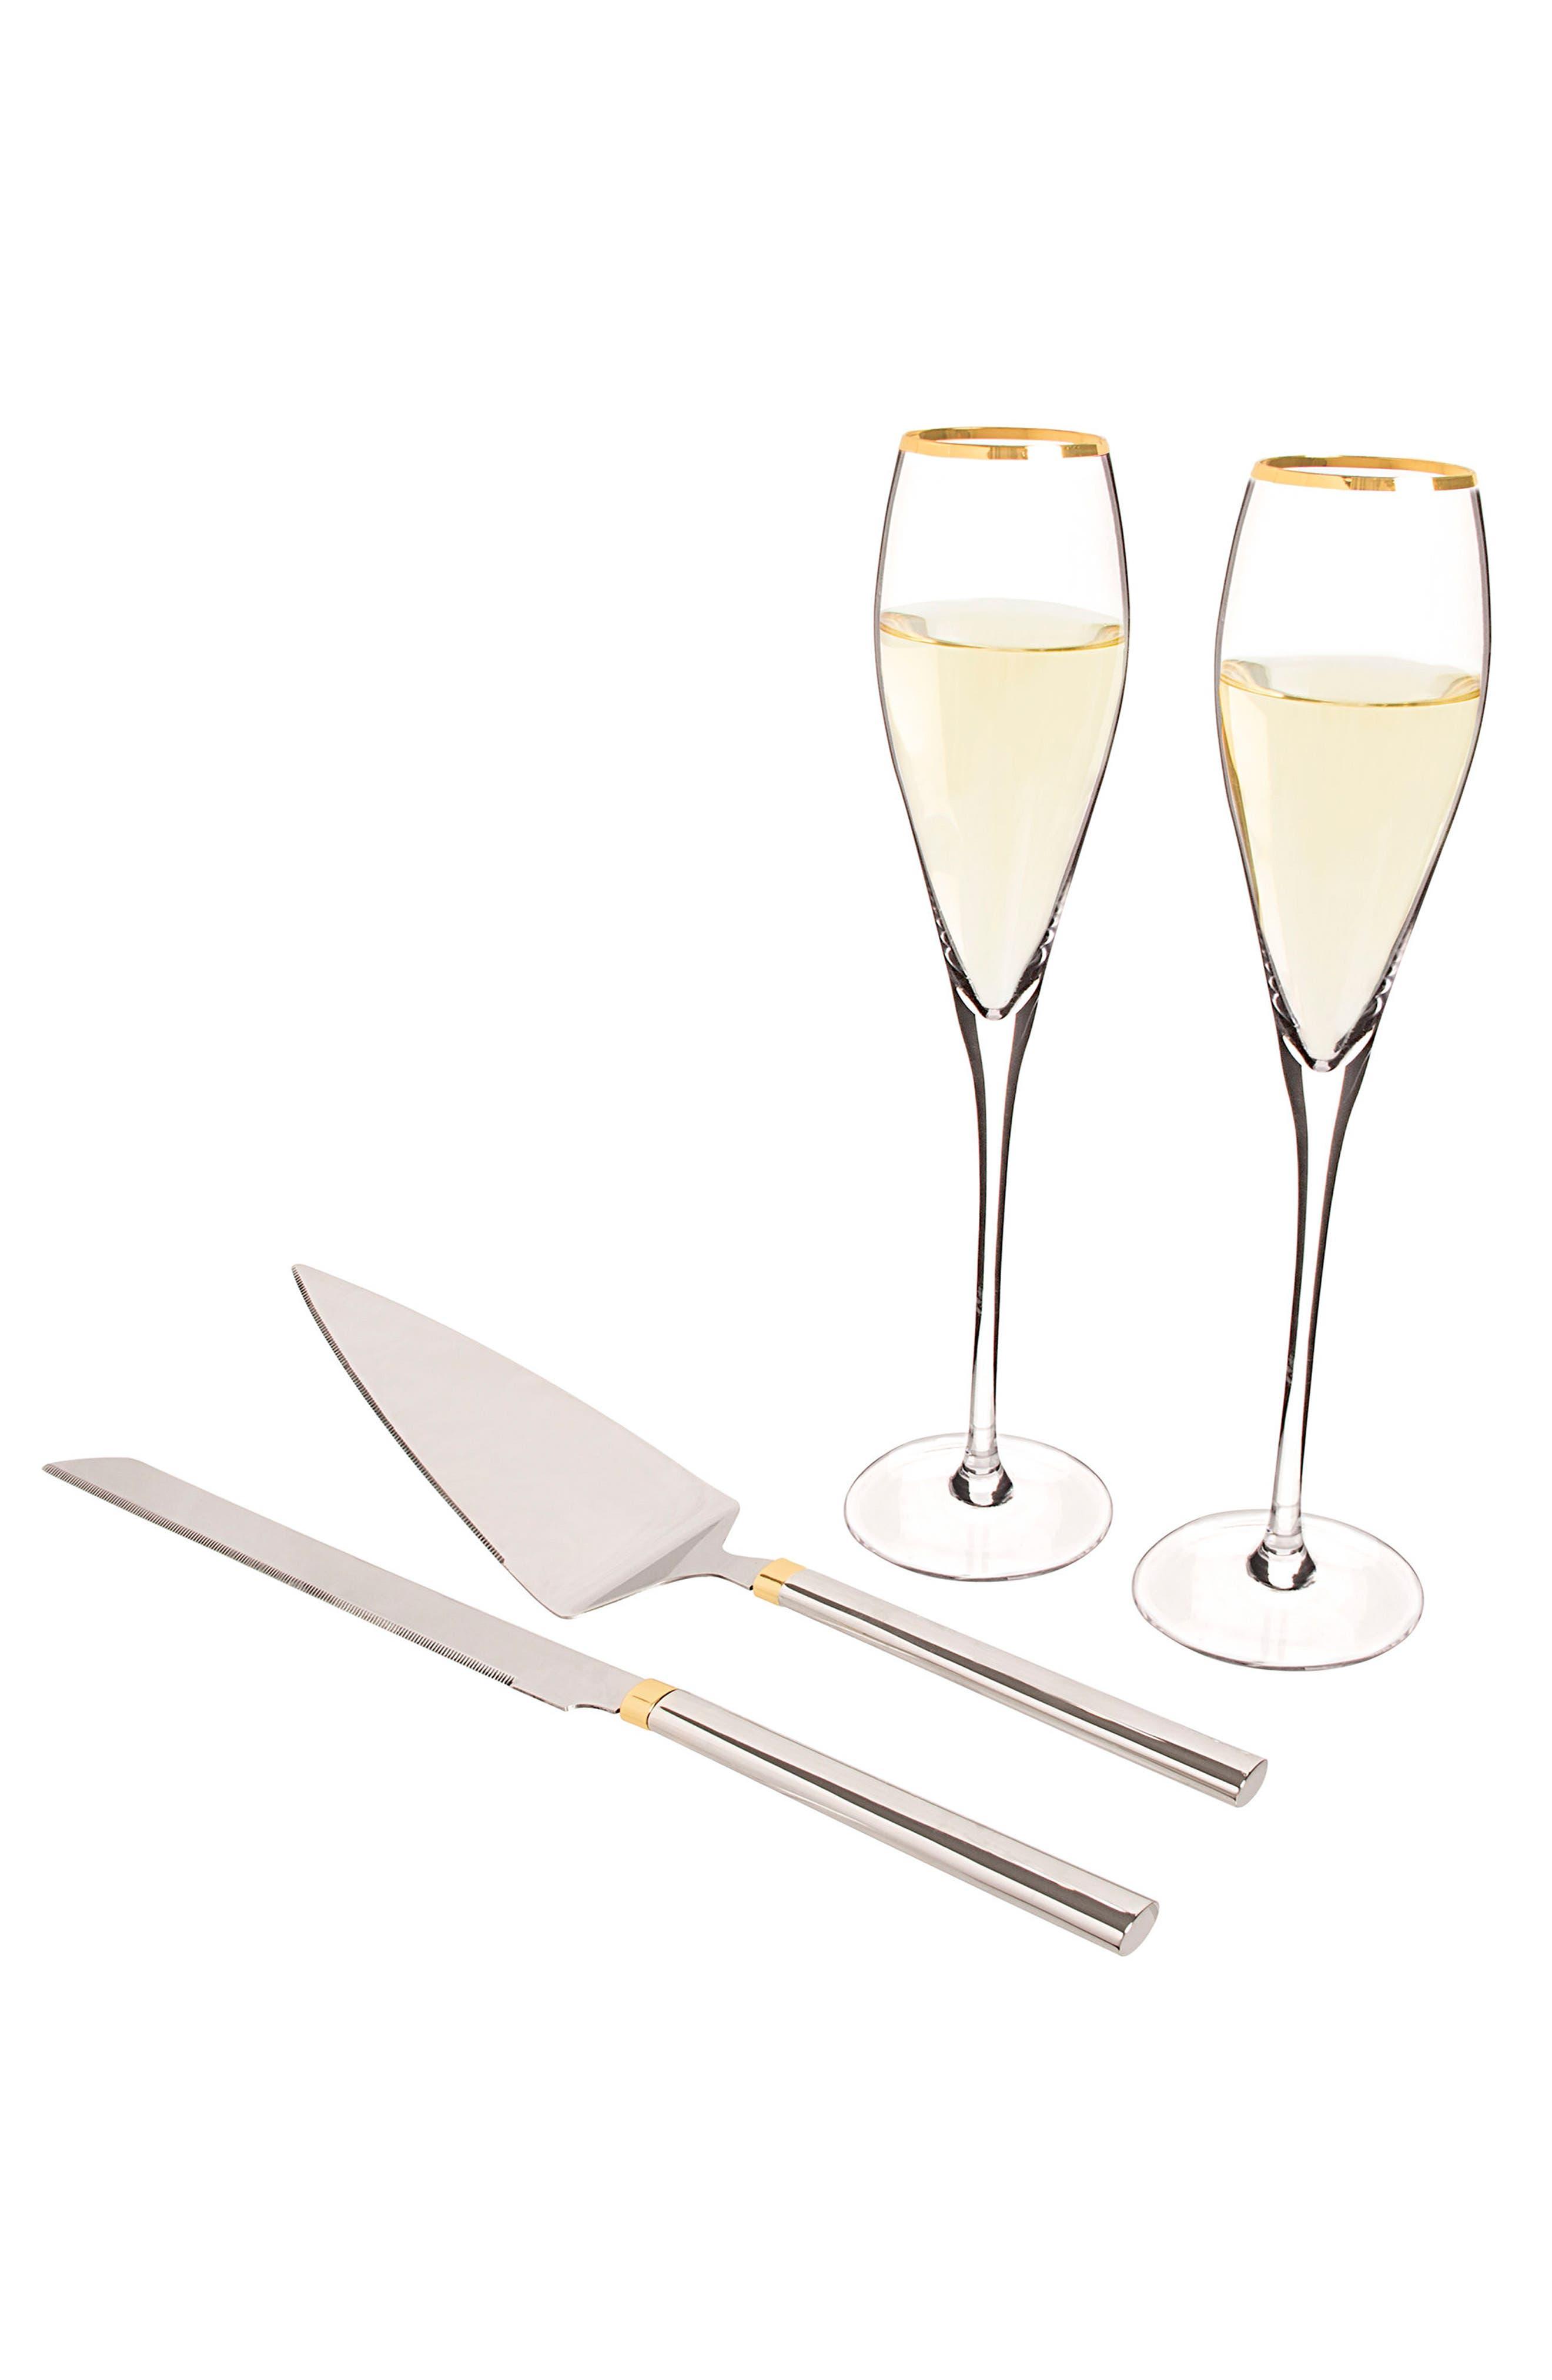 Monogram Champagne Flutes & Cake Server Set,                             Main thumbnail 1, color,                             710